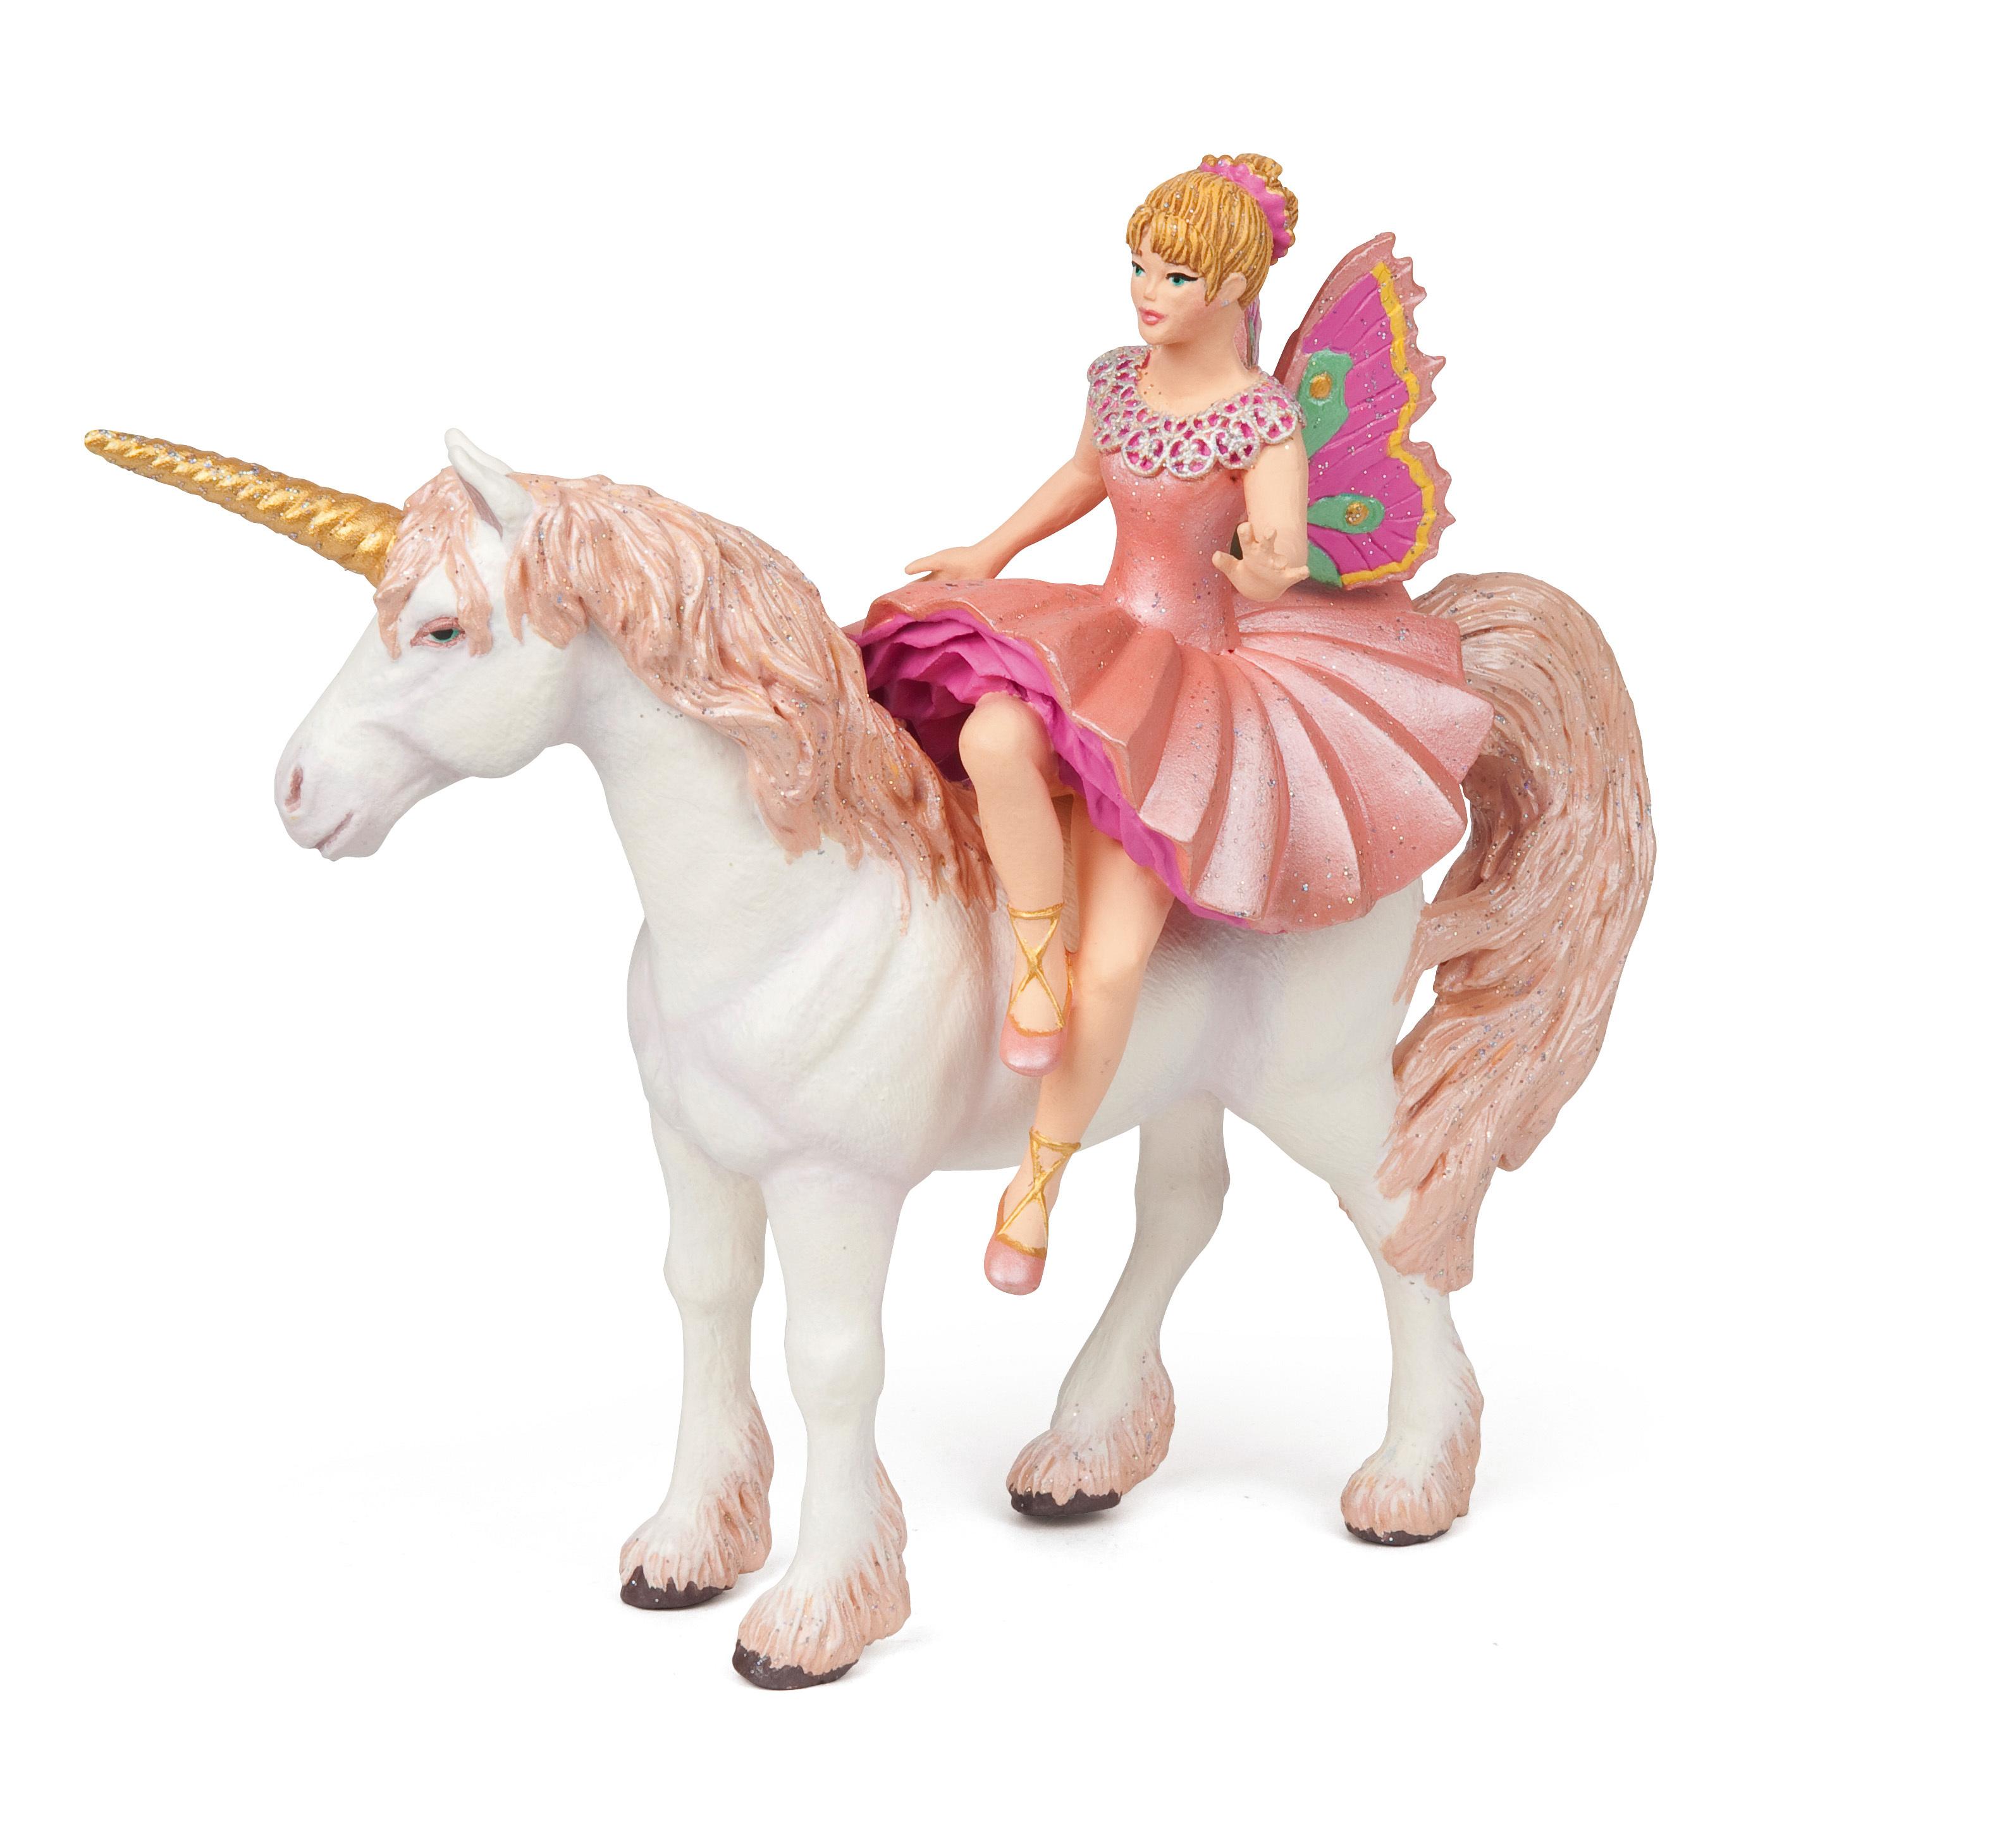 Ballerine sur sa licorne - PAPO - 38822